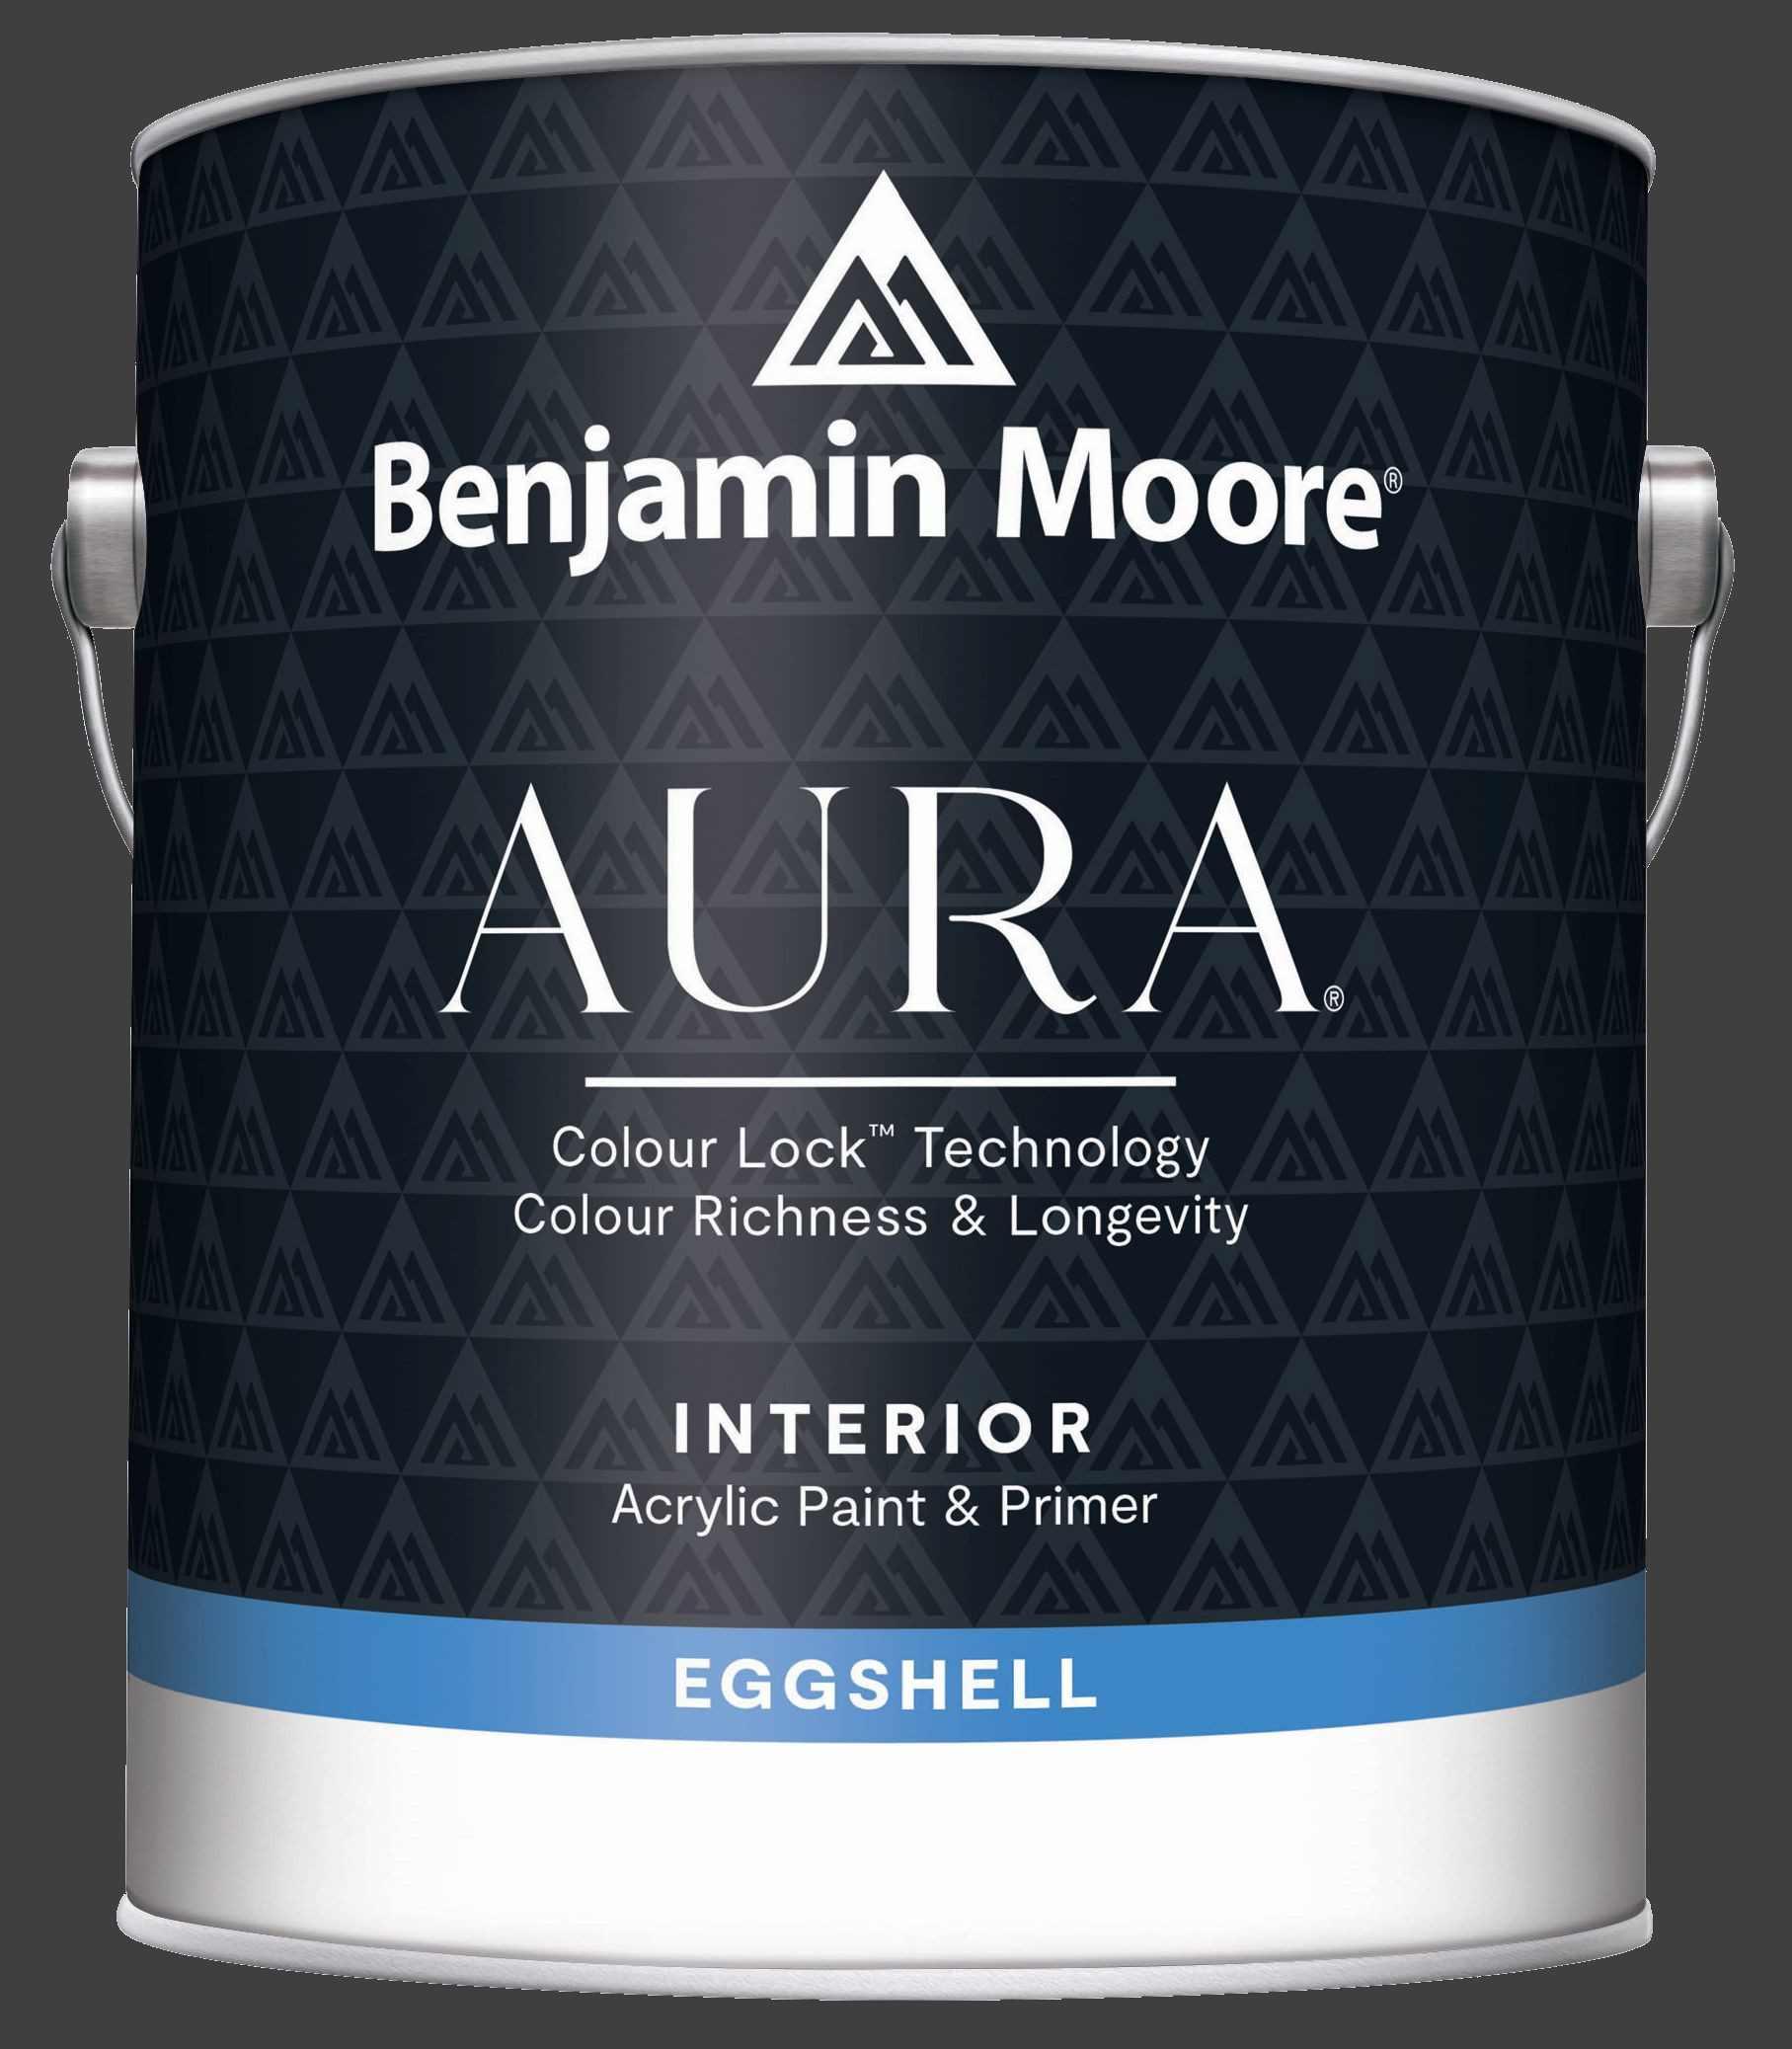 Benjamin Moore, Aura Waterborne Interior Paint